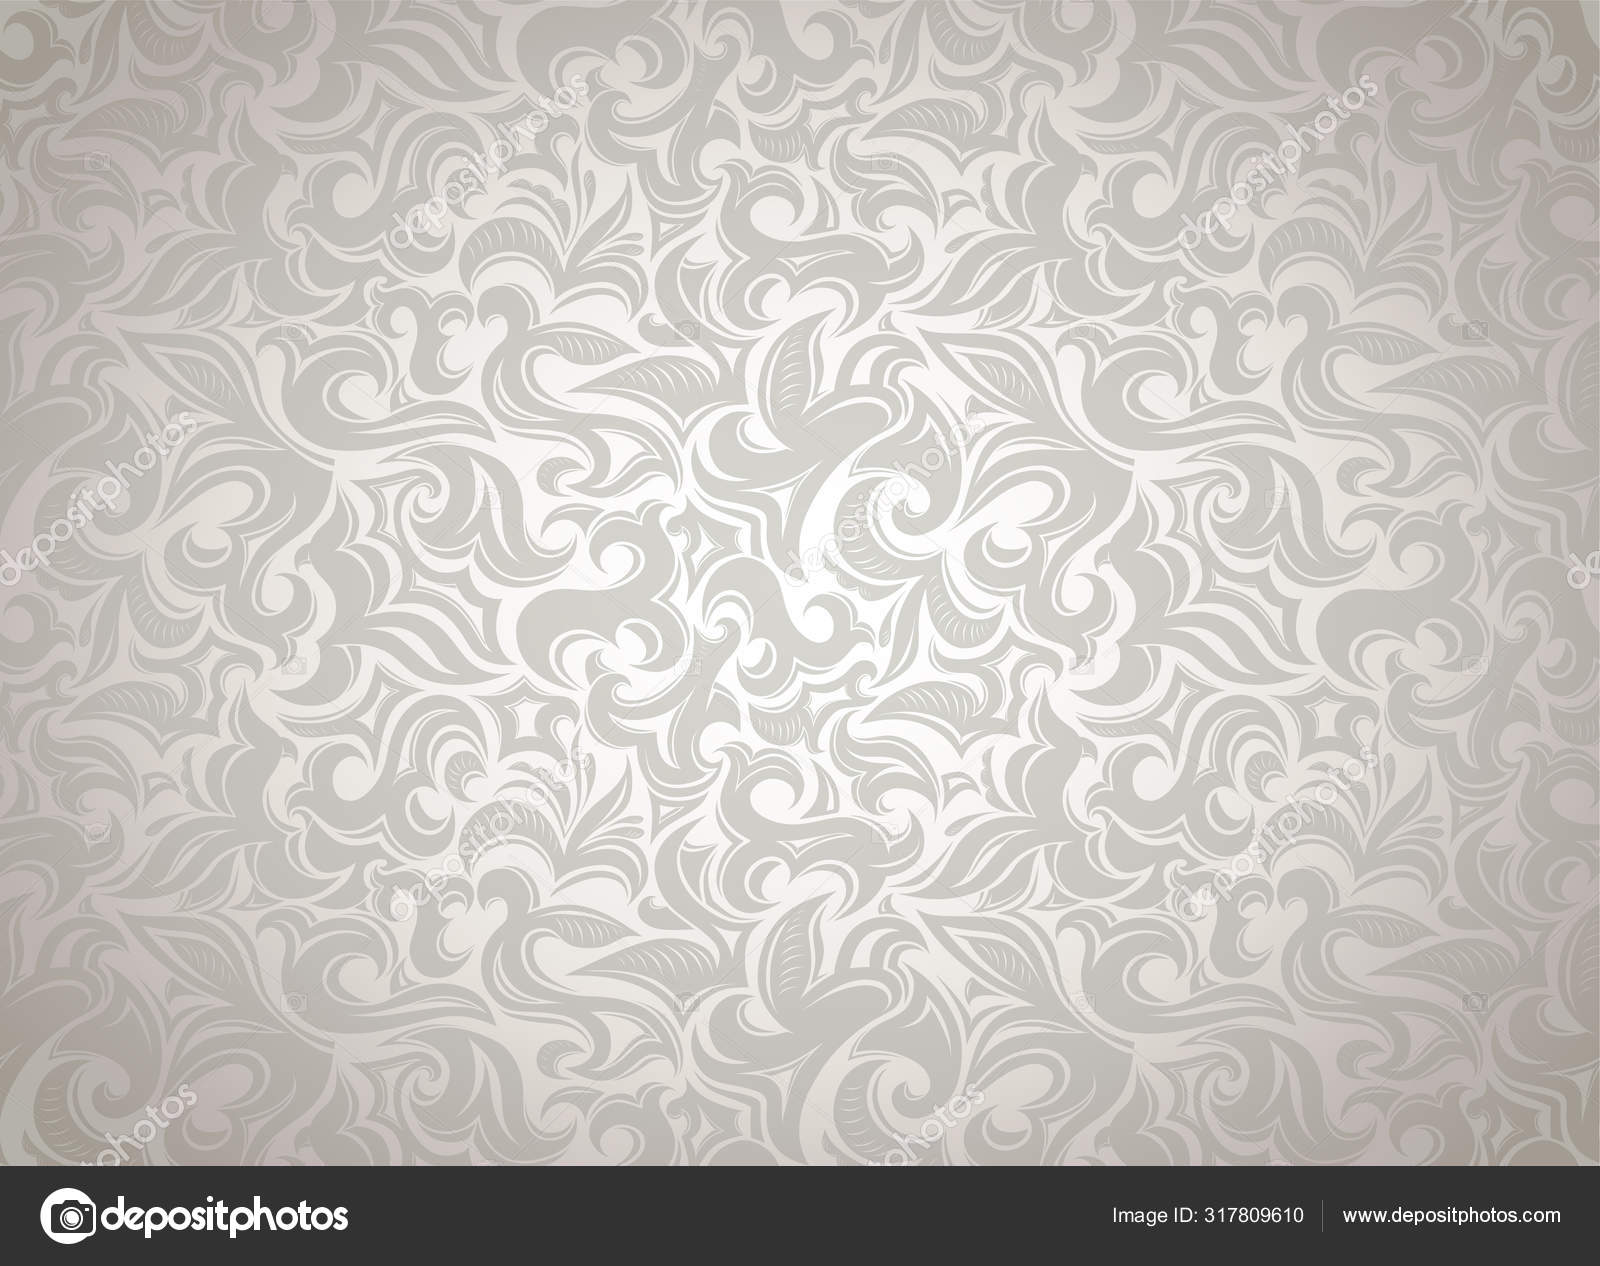 Damask Vintage White Background Floral Elements Gothic Baroque